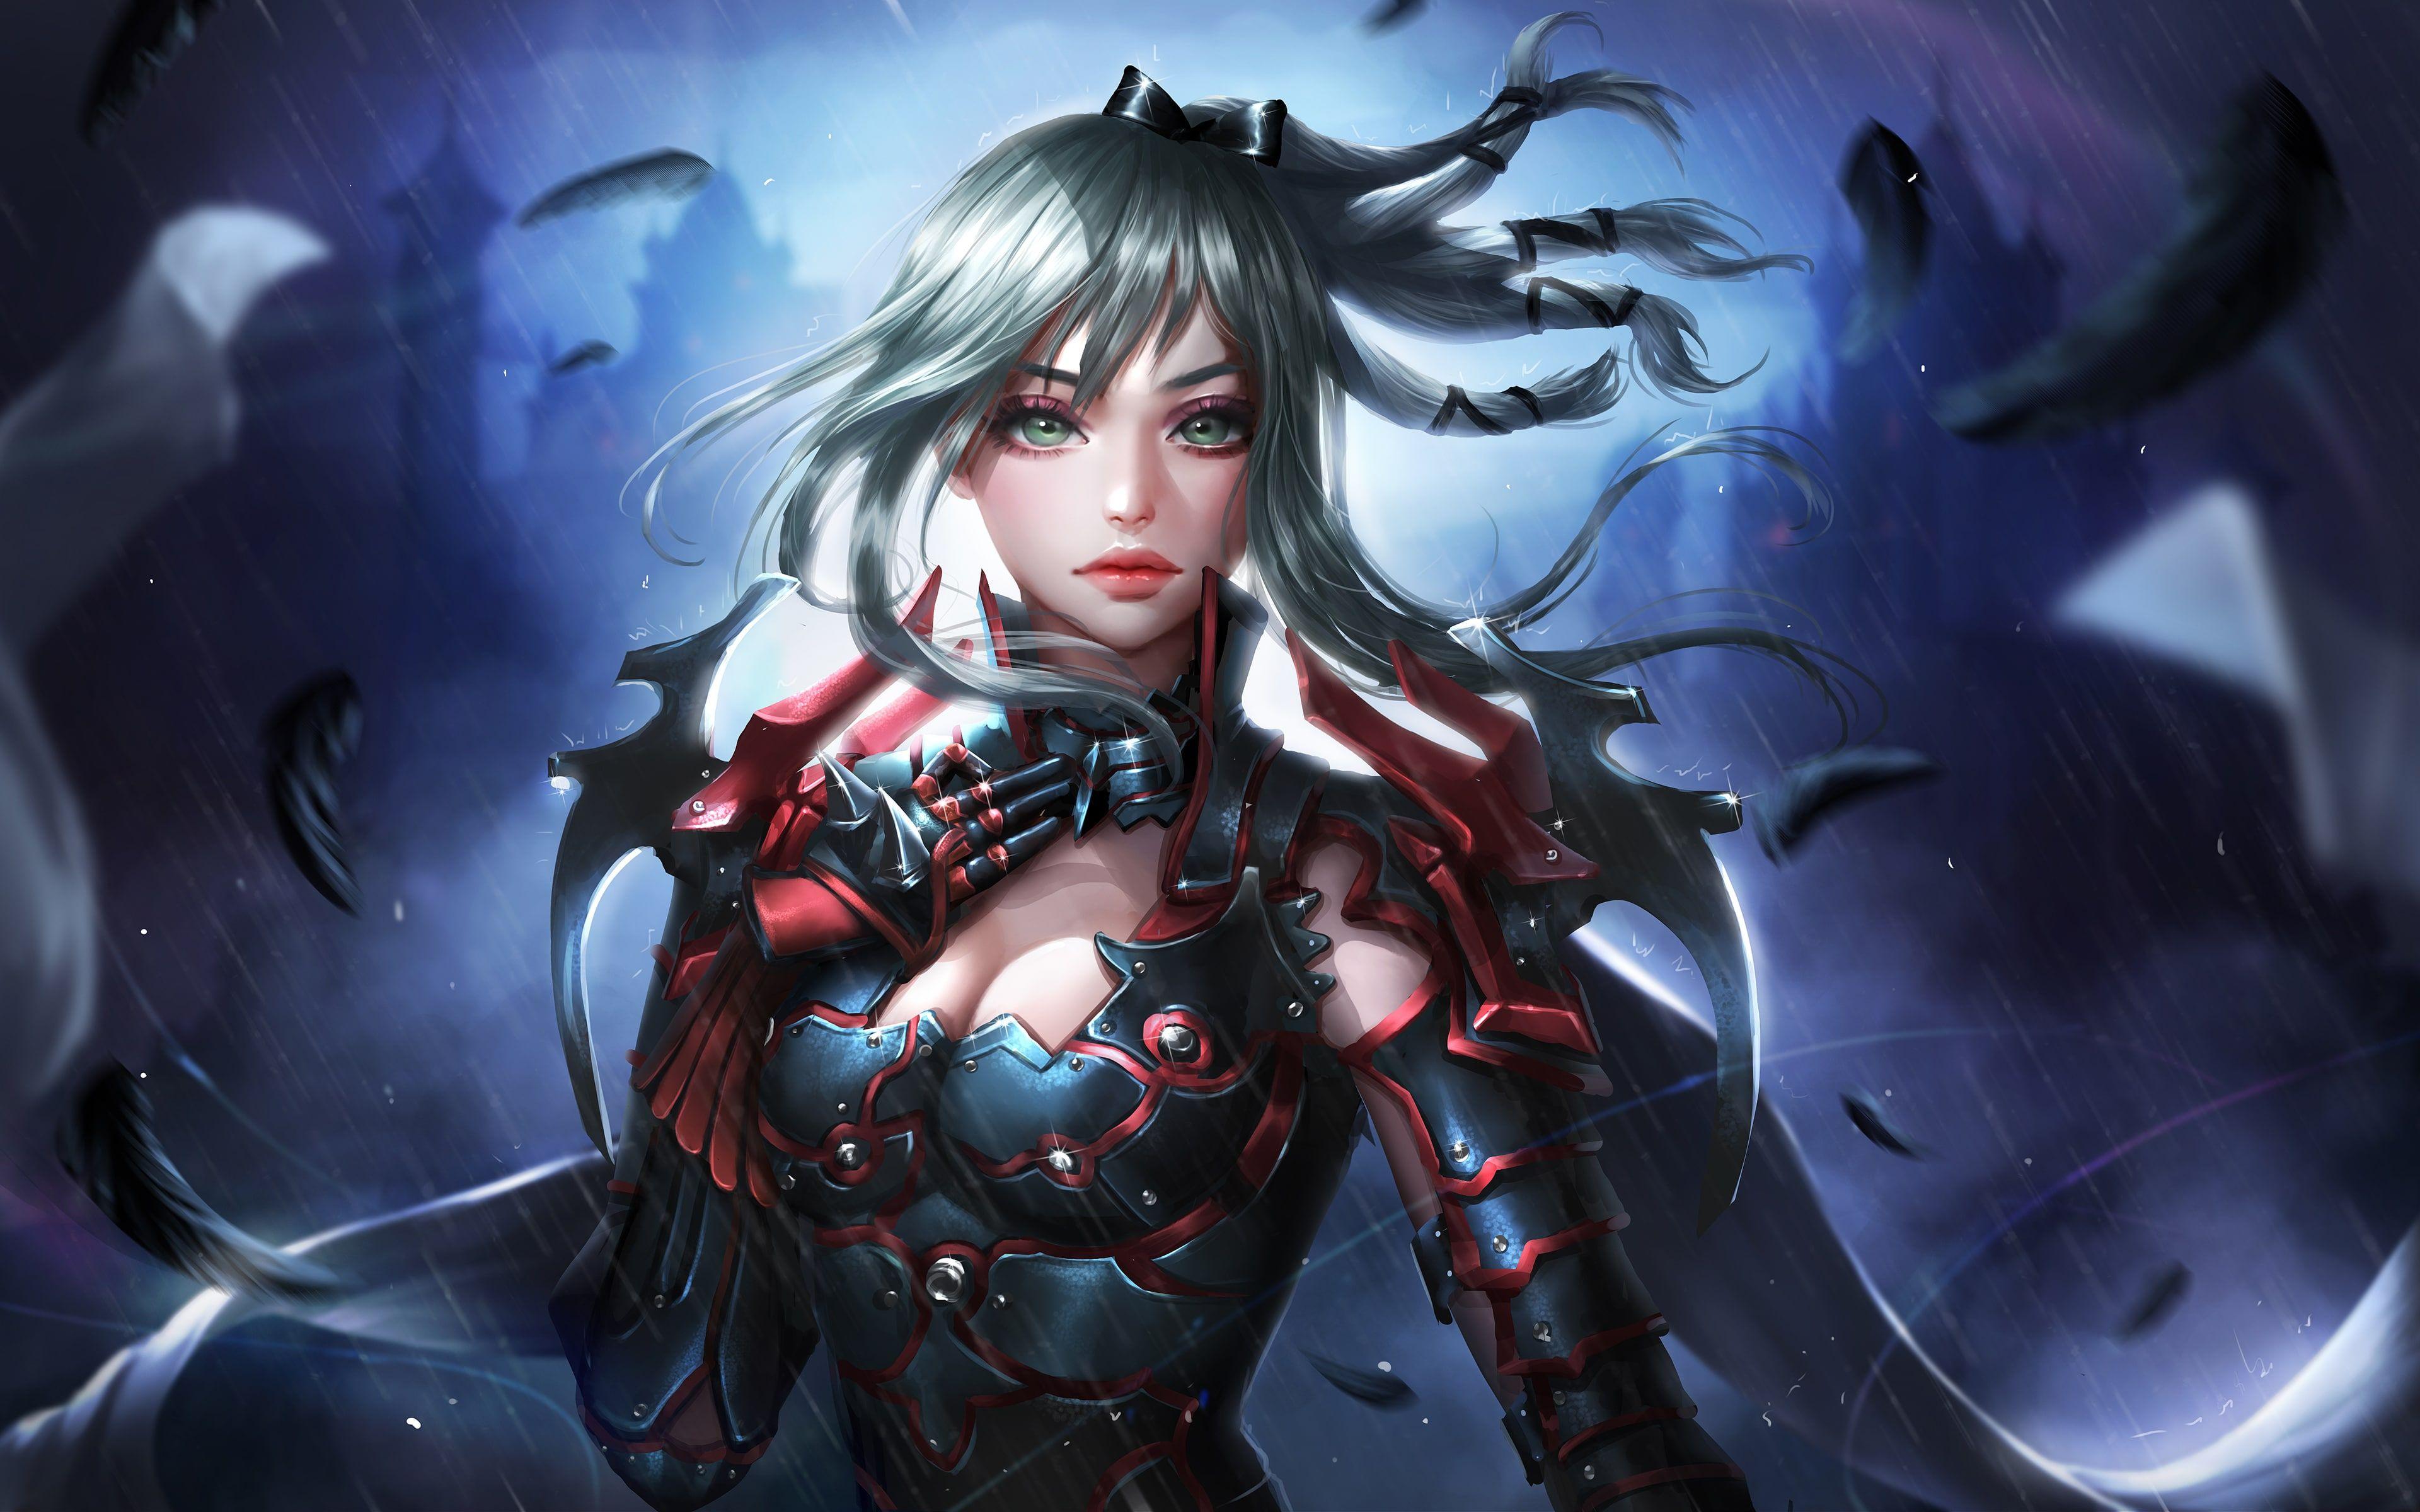 Aranea Highwind Final Fantasy Character 5k Final Fantasy Girls